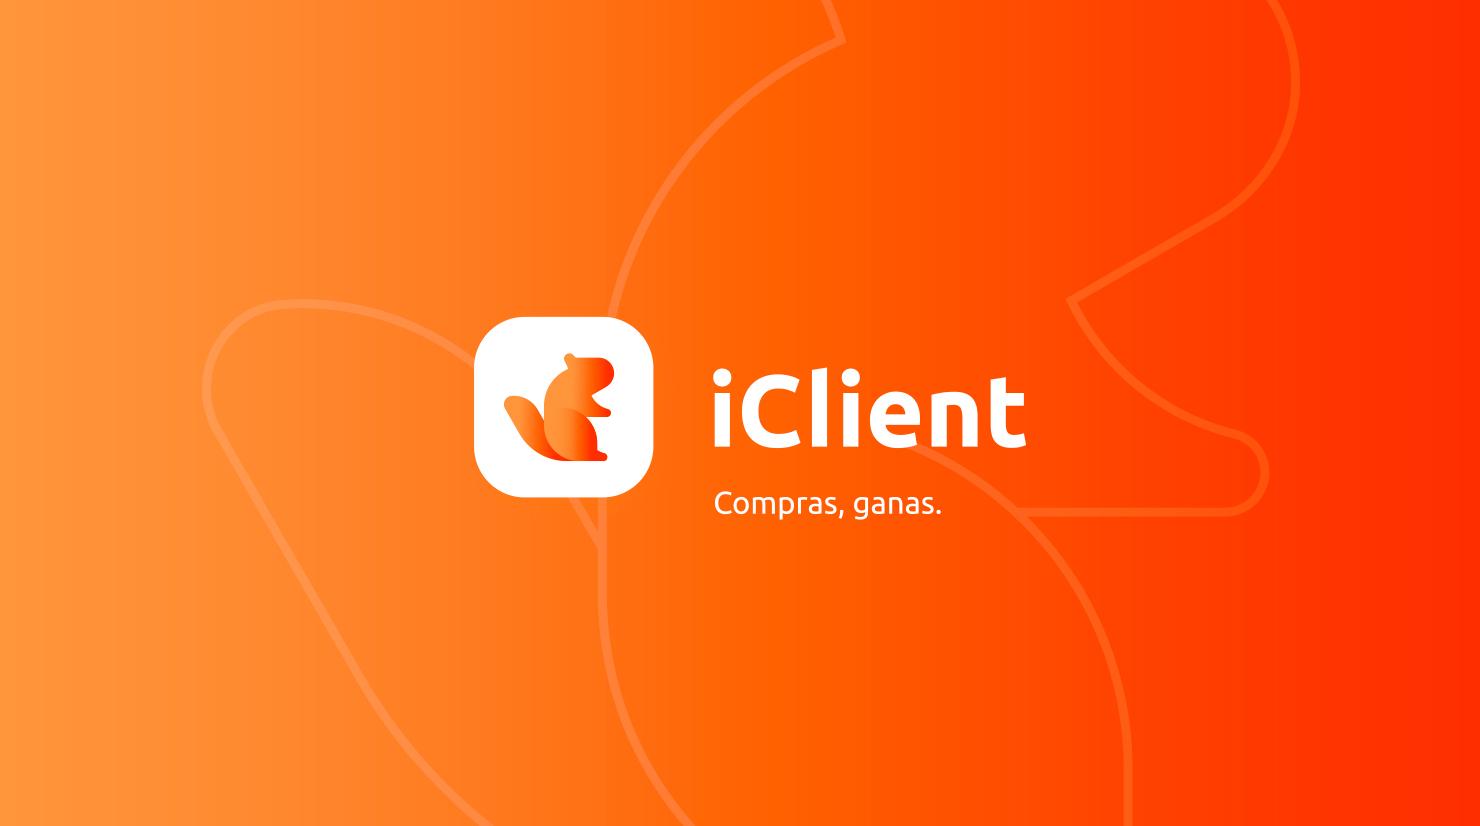 logo iclient